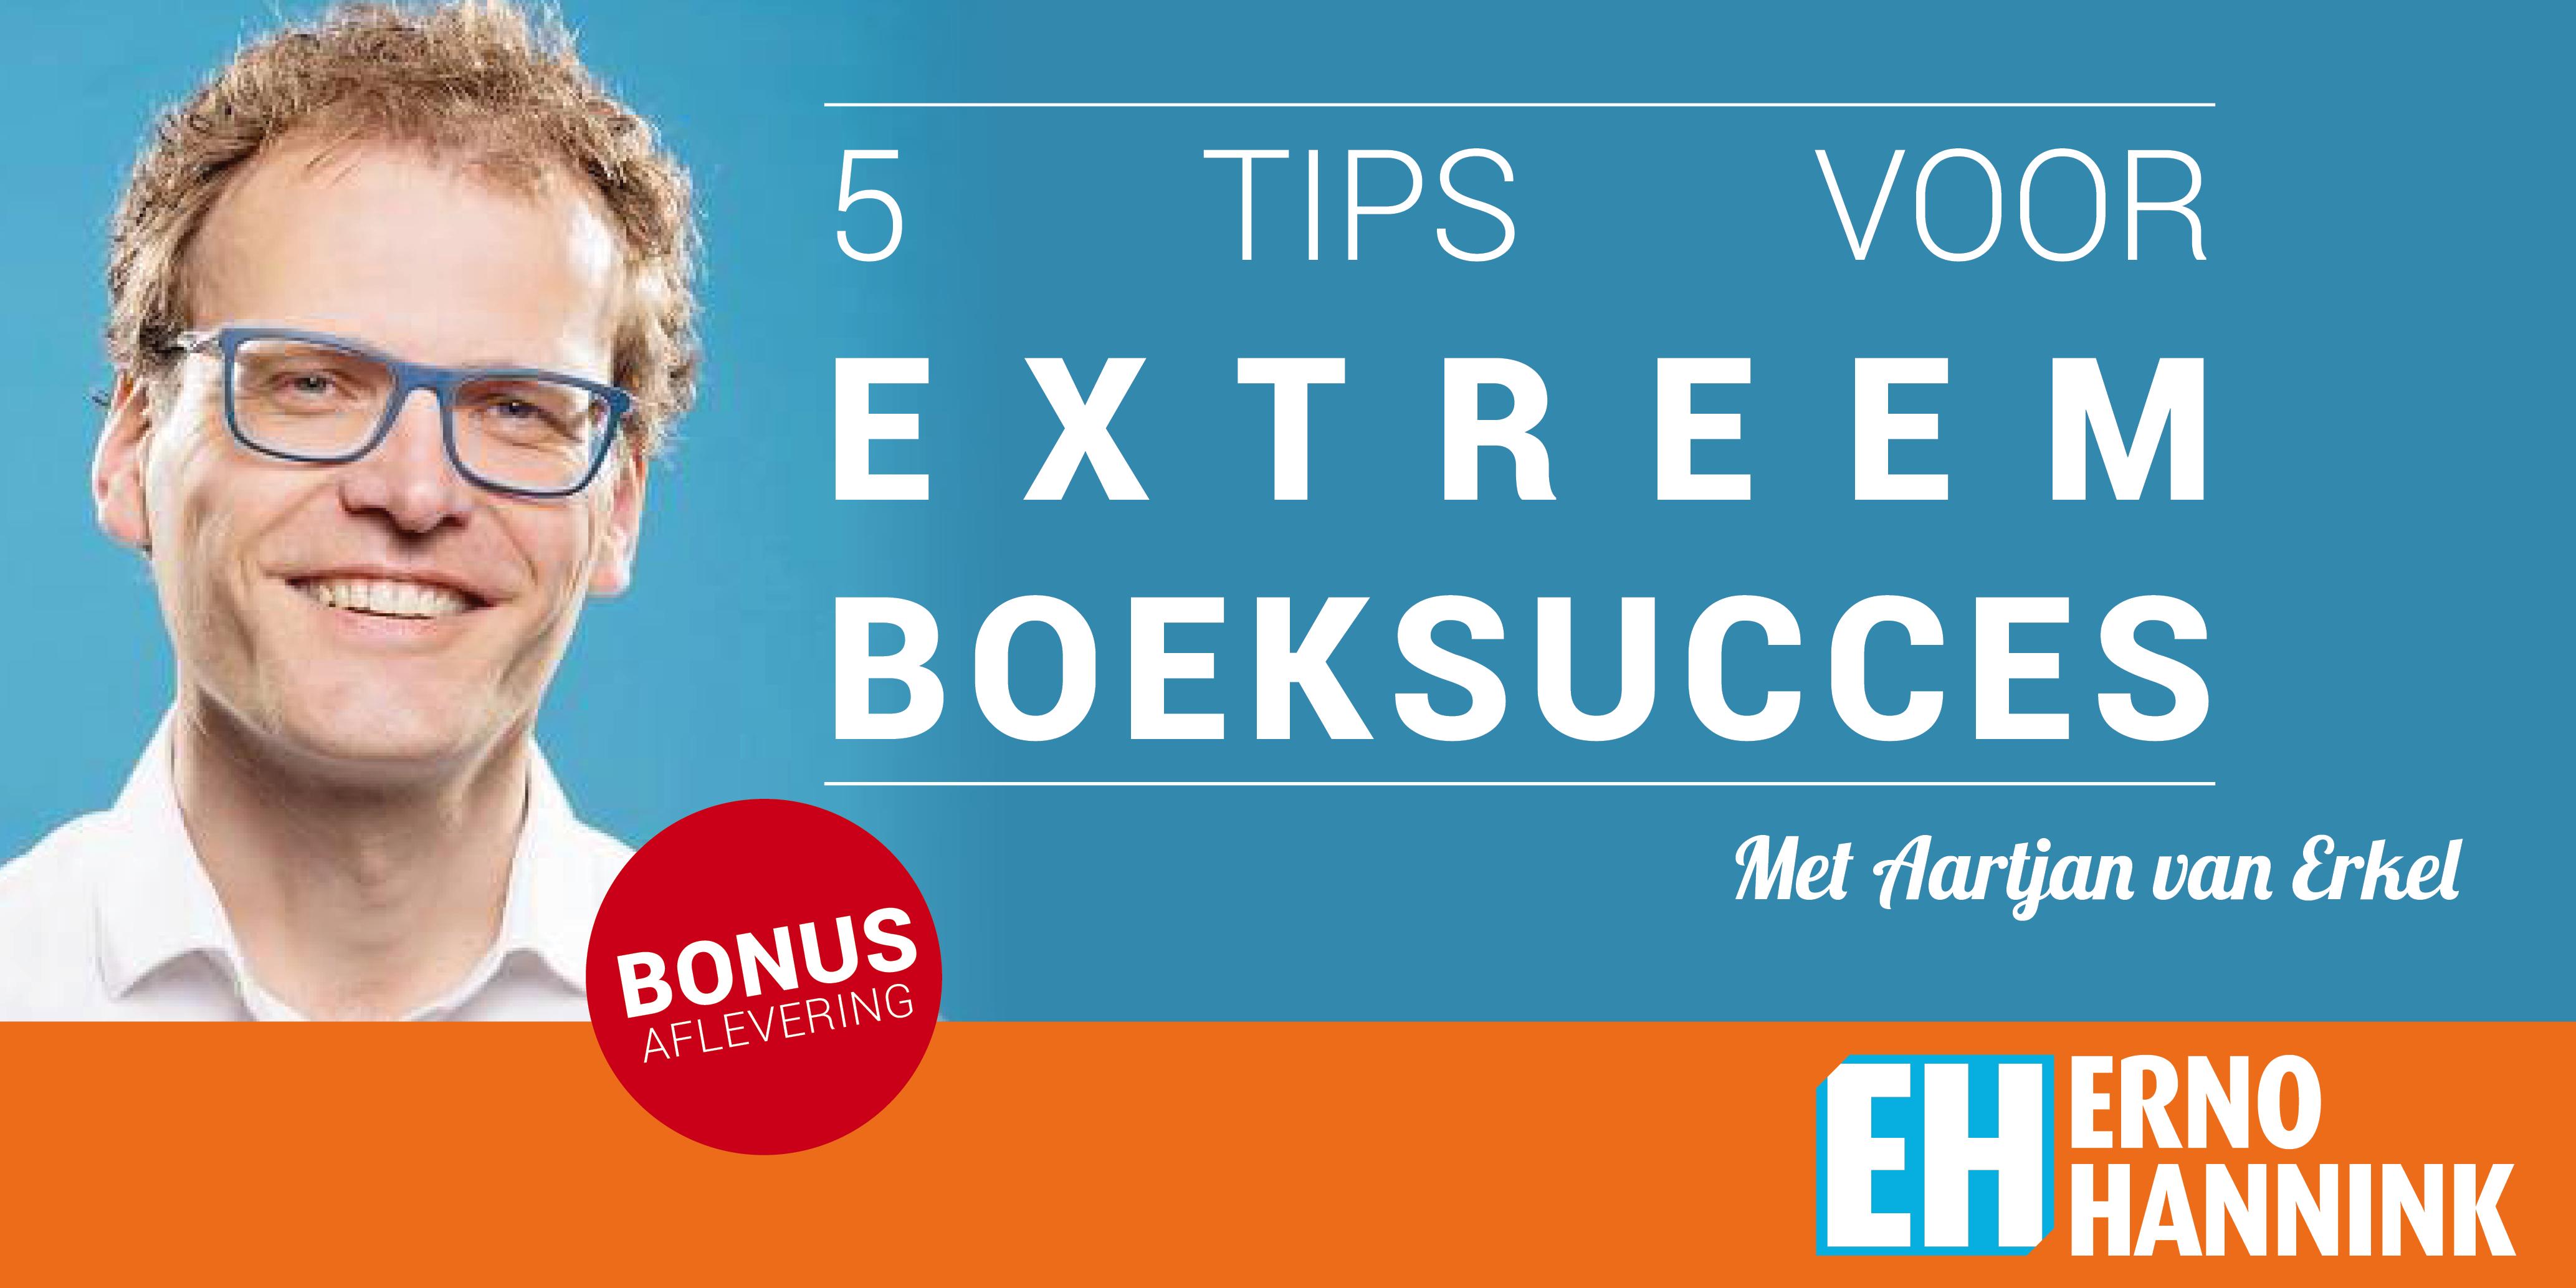 boek verkoop succes Aartjan van Erkel